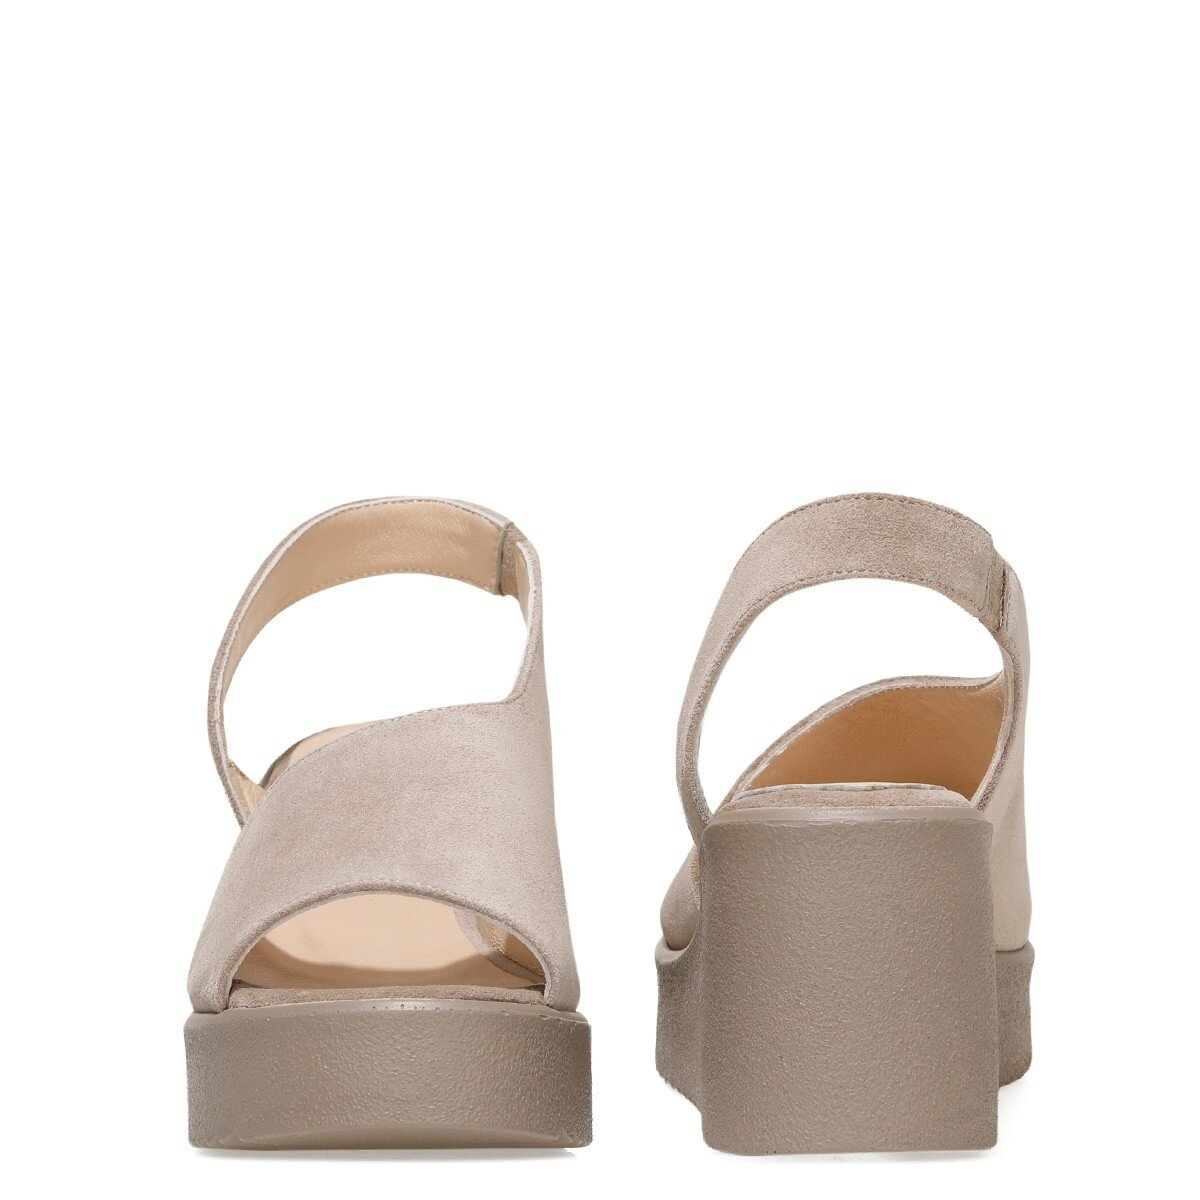 SANTEYOUNG 1FX Vizon Kadın Dolgu Topuk Sandalet